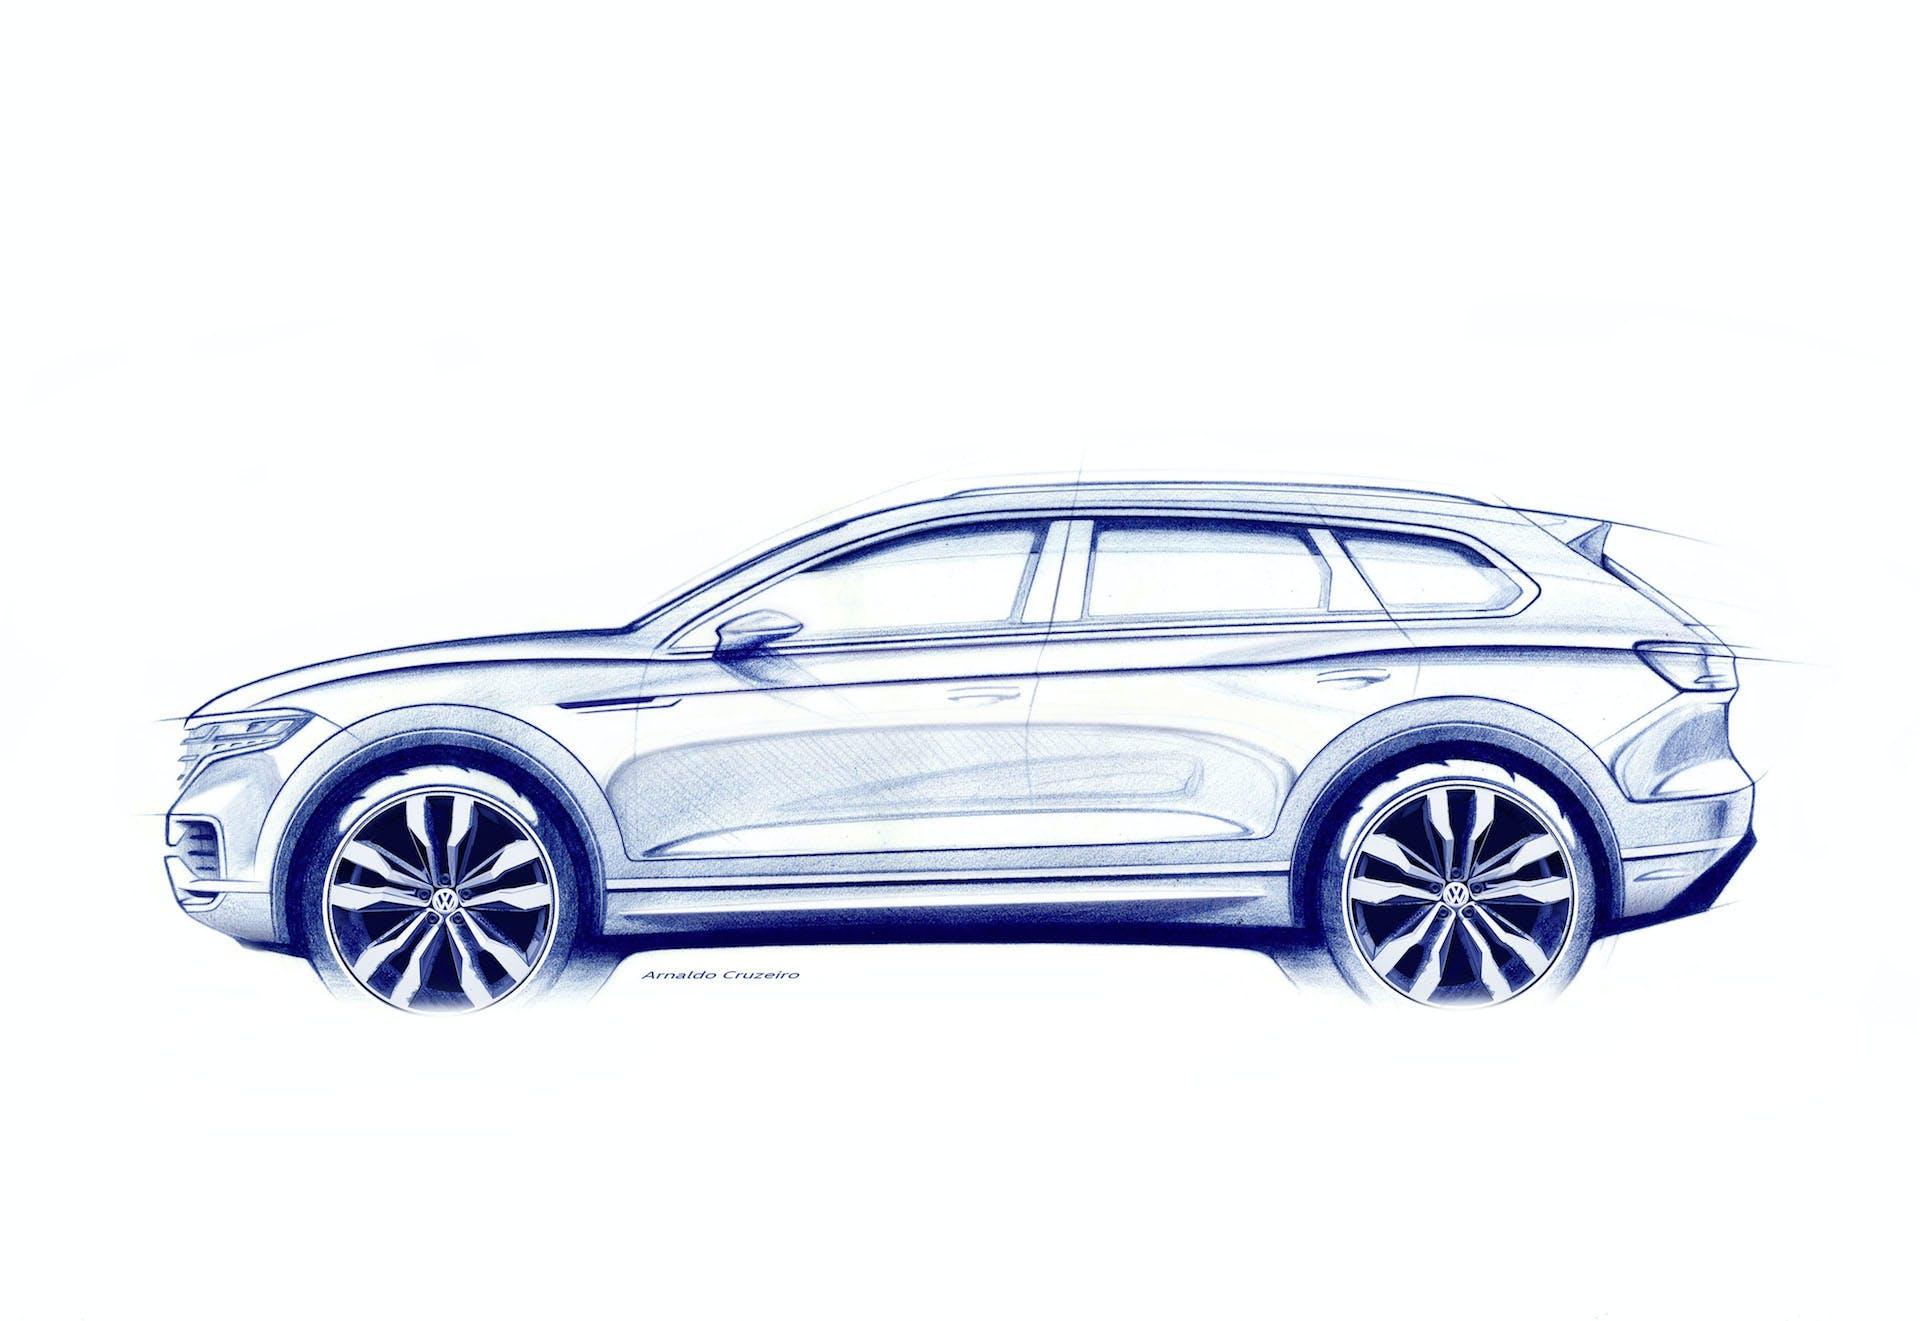 Nuova Volkswagen Touareg disegno sketch